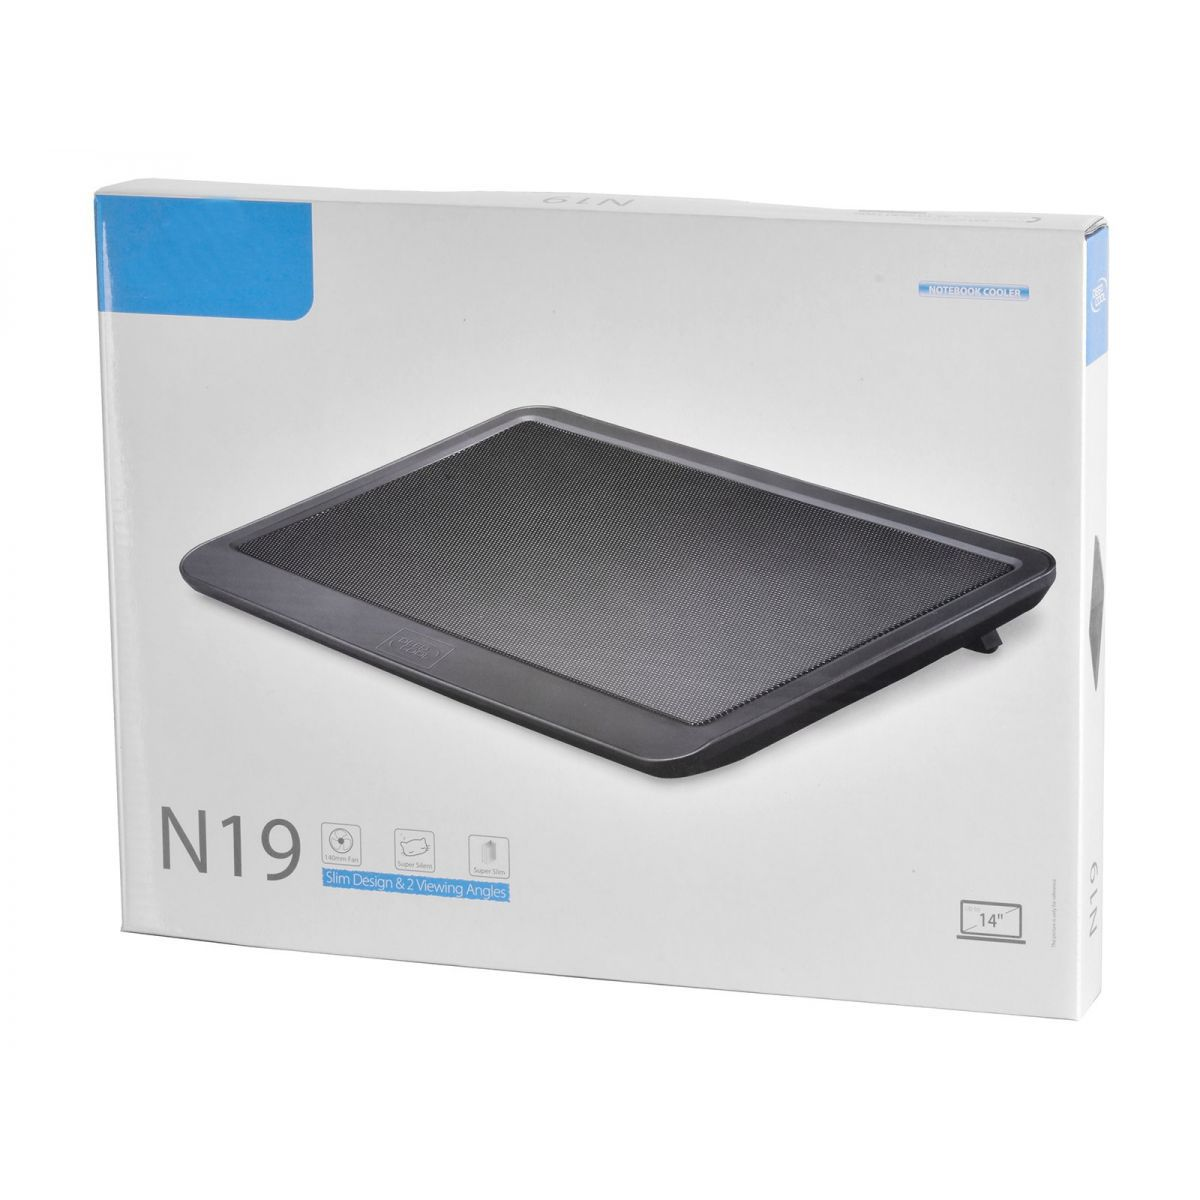 Kit 2x Base Cooler Notebook N19 Oletech